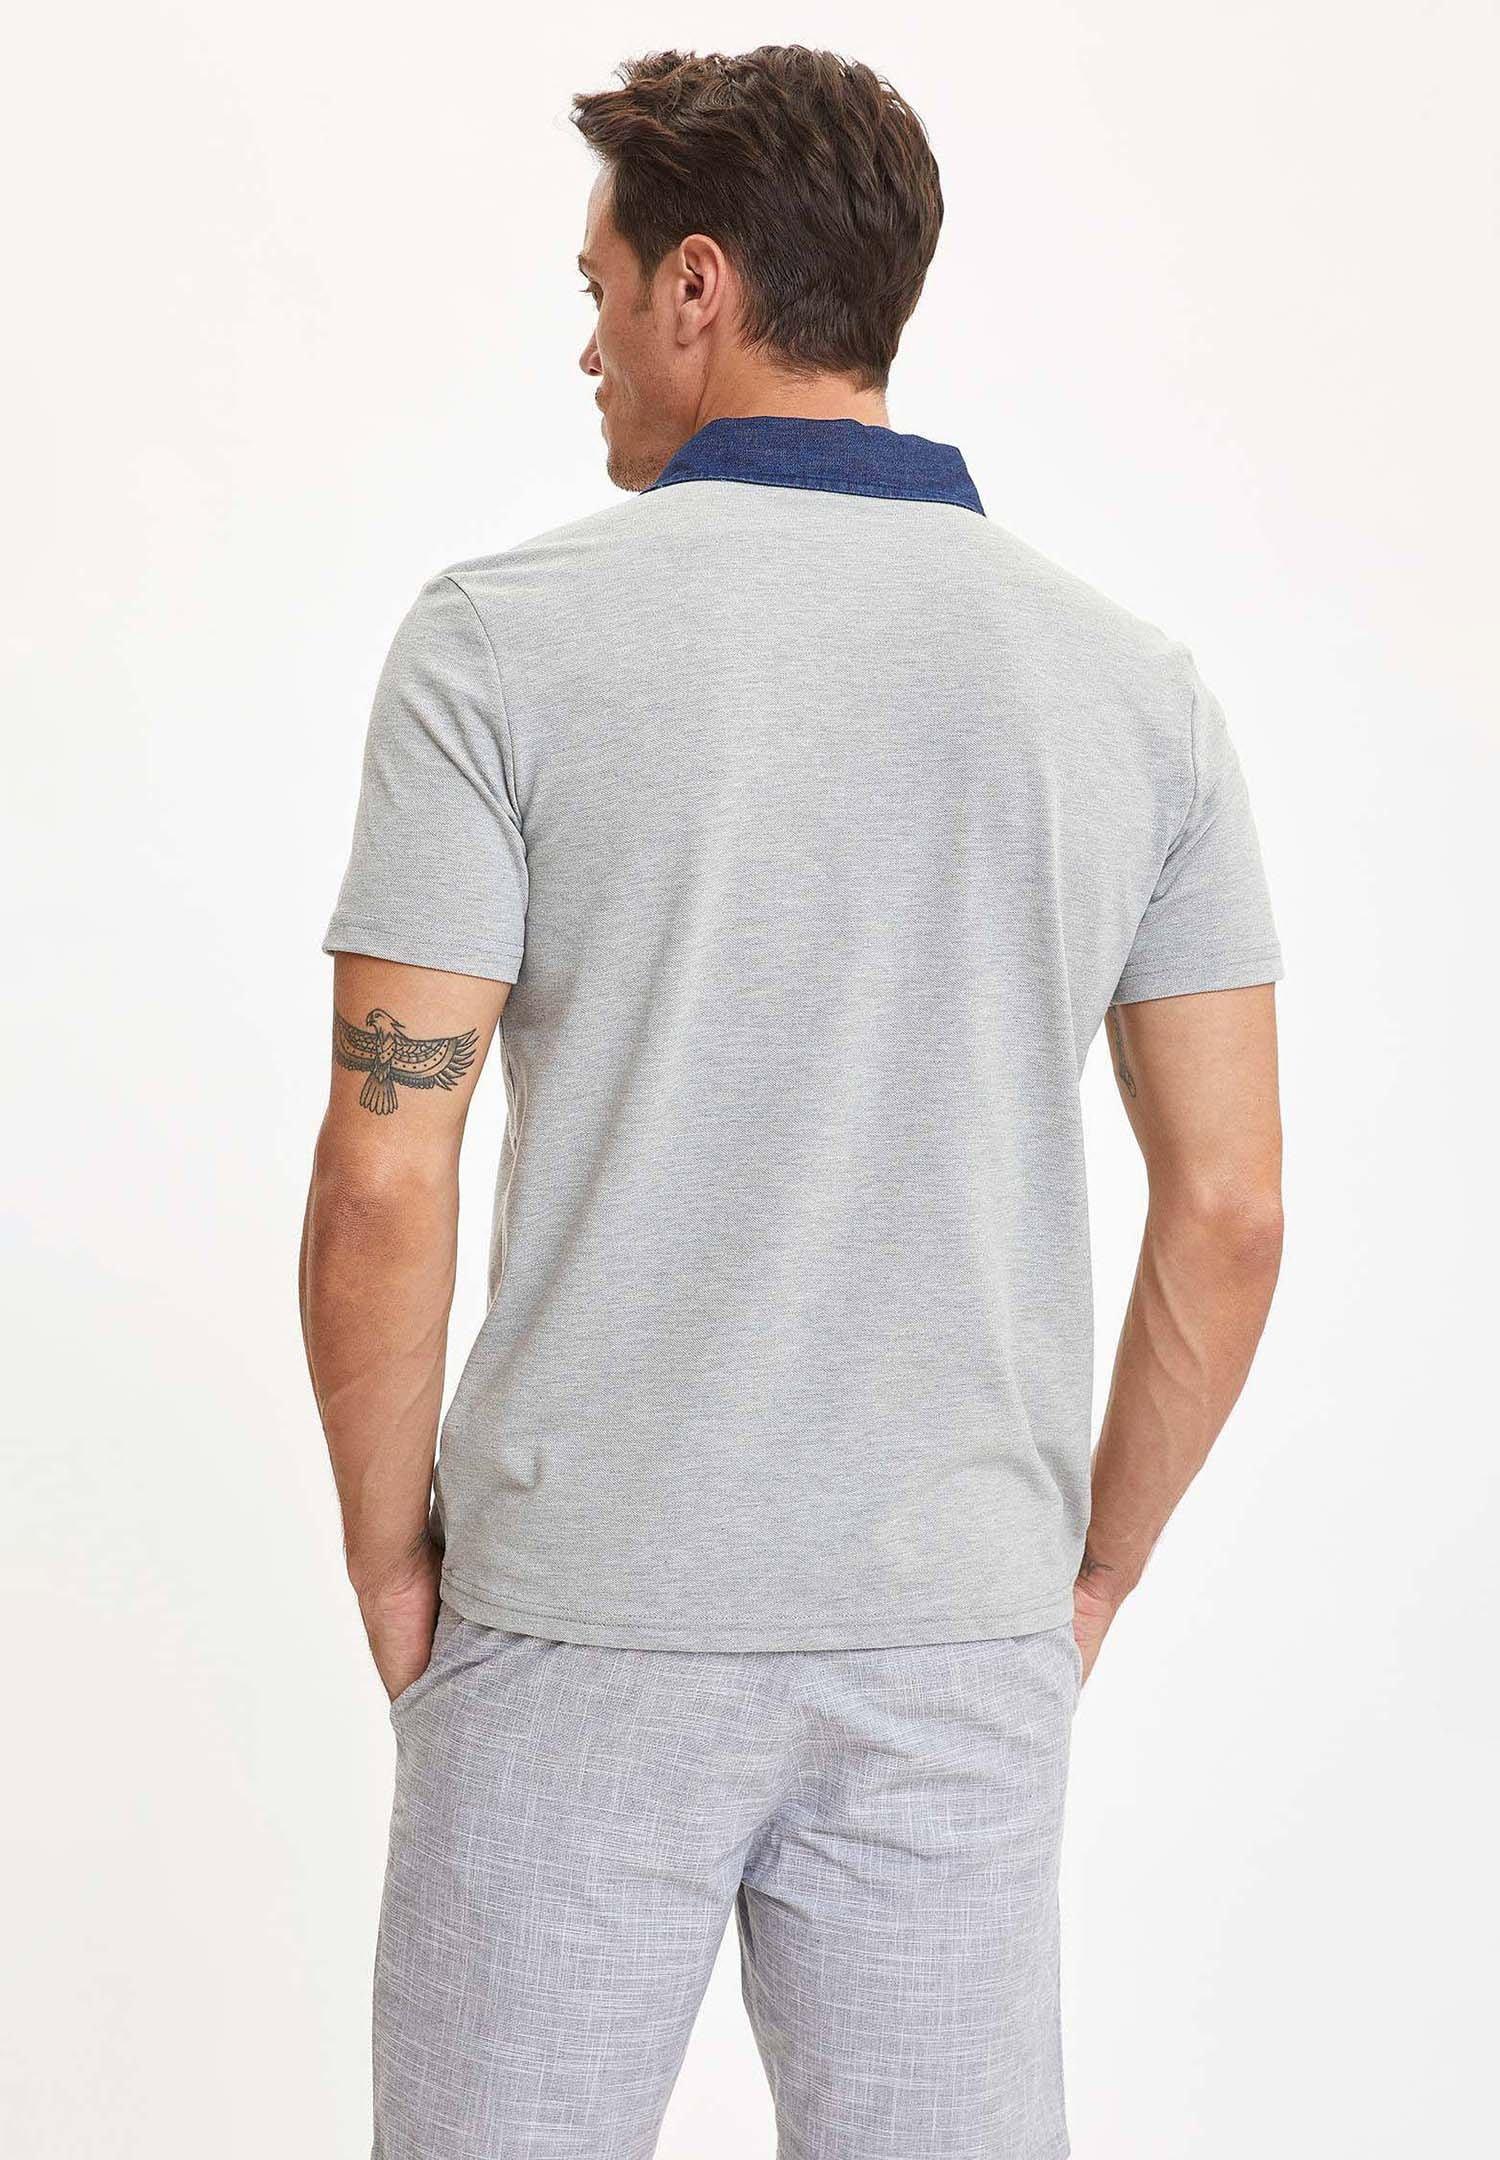 DeFacto Polo shirt - grey zyK96